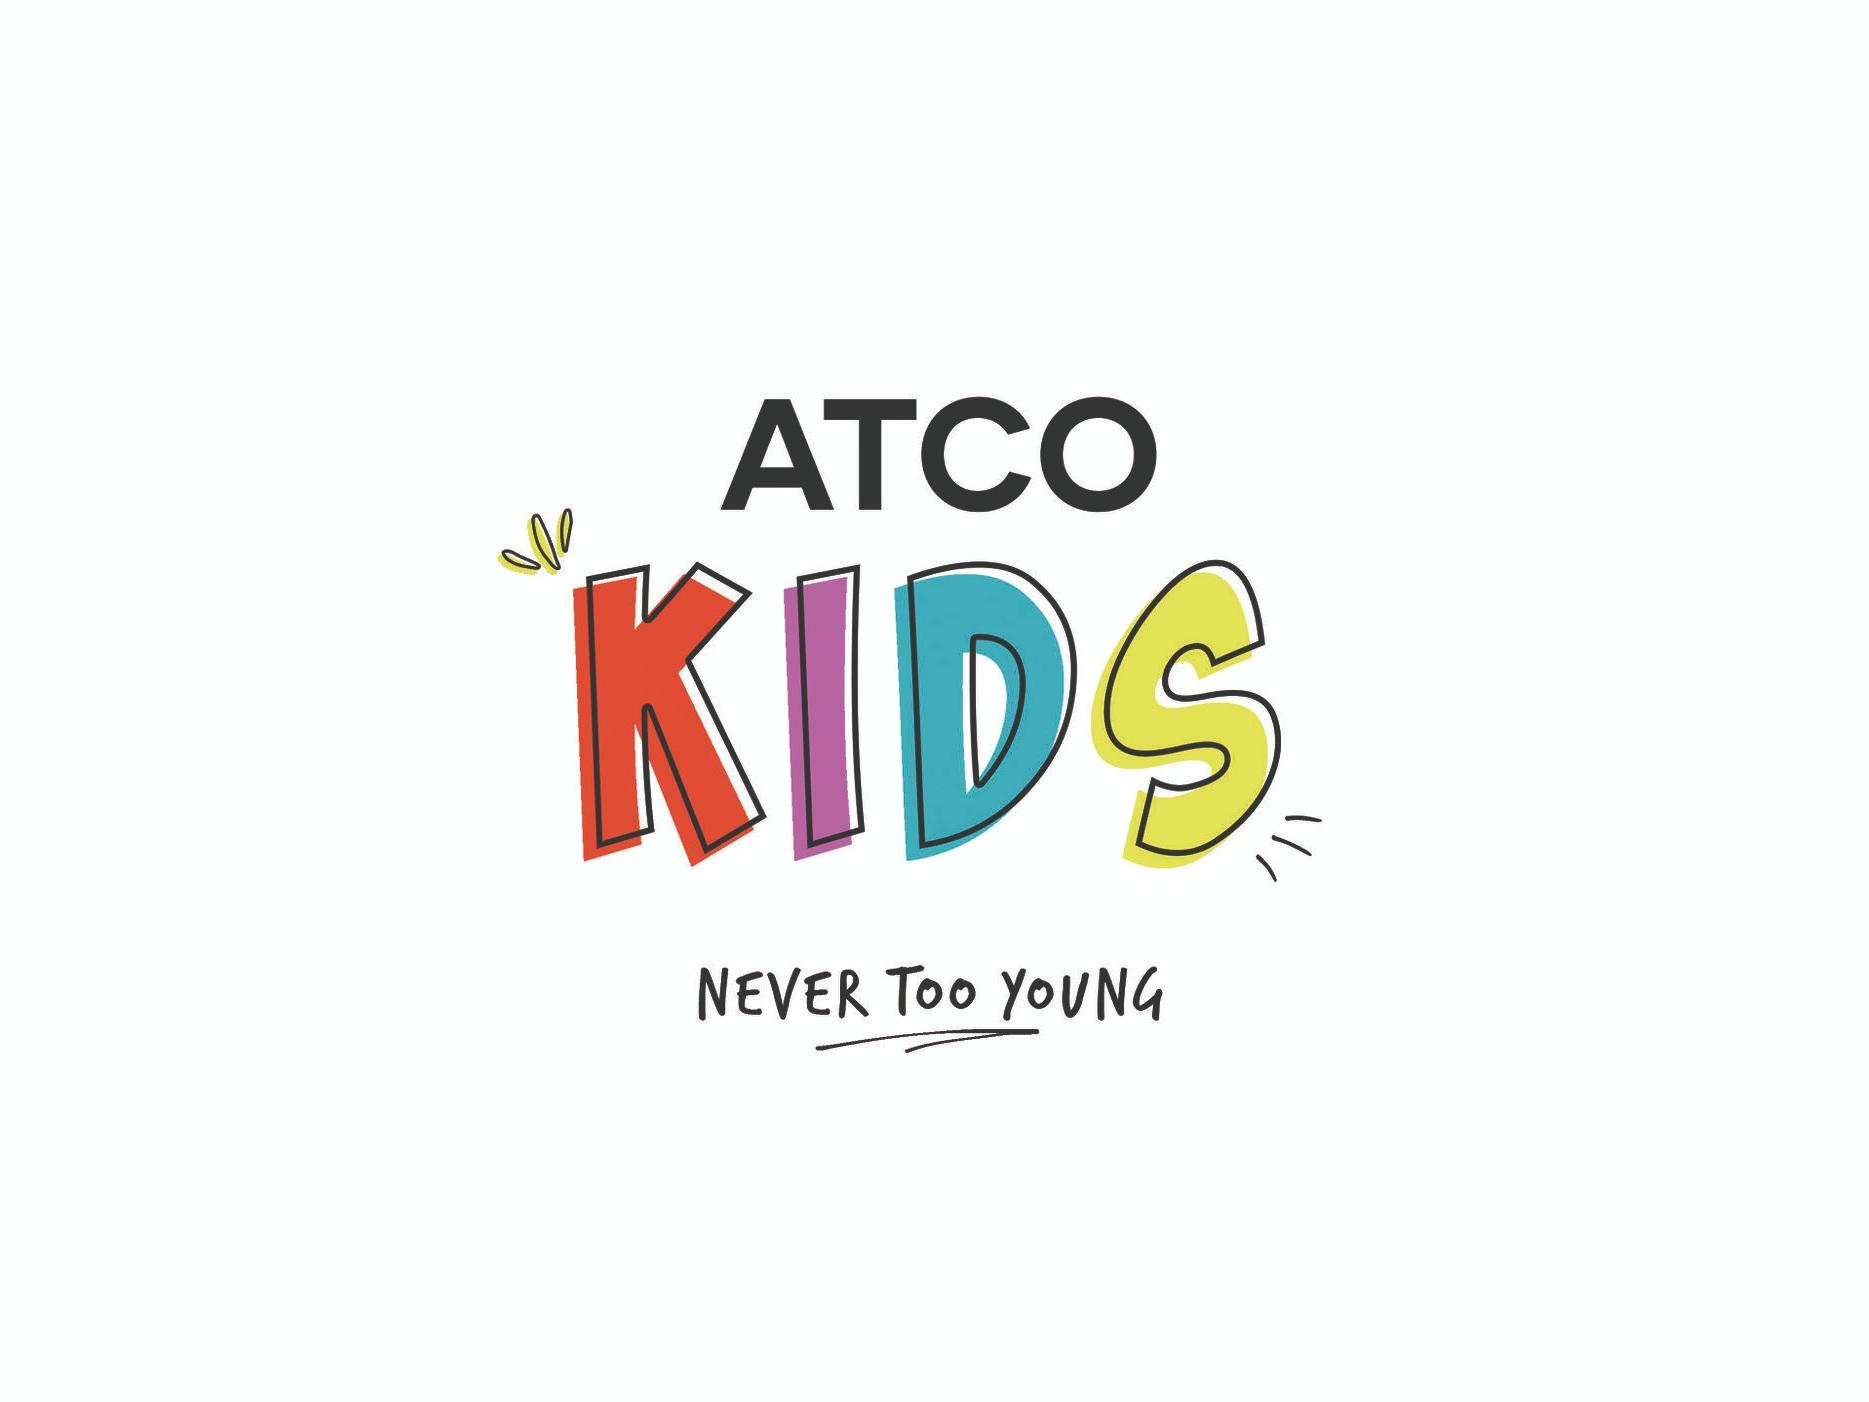 Atco kids